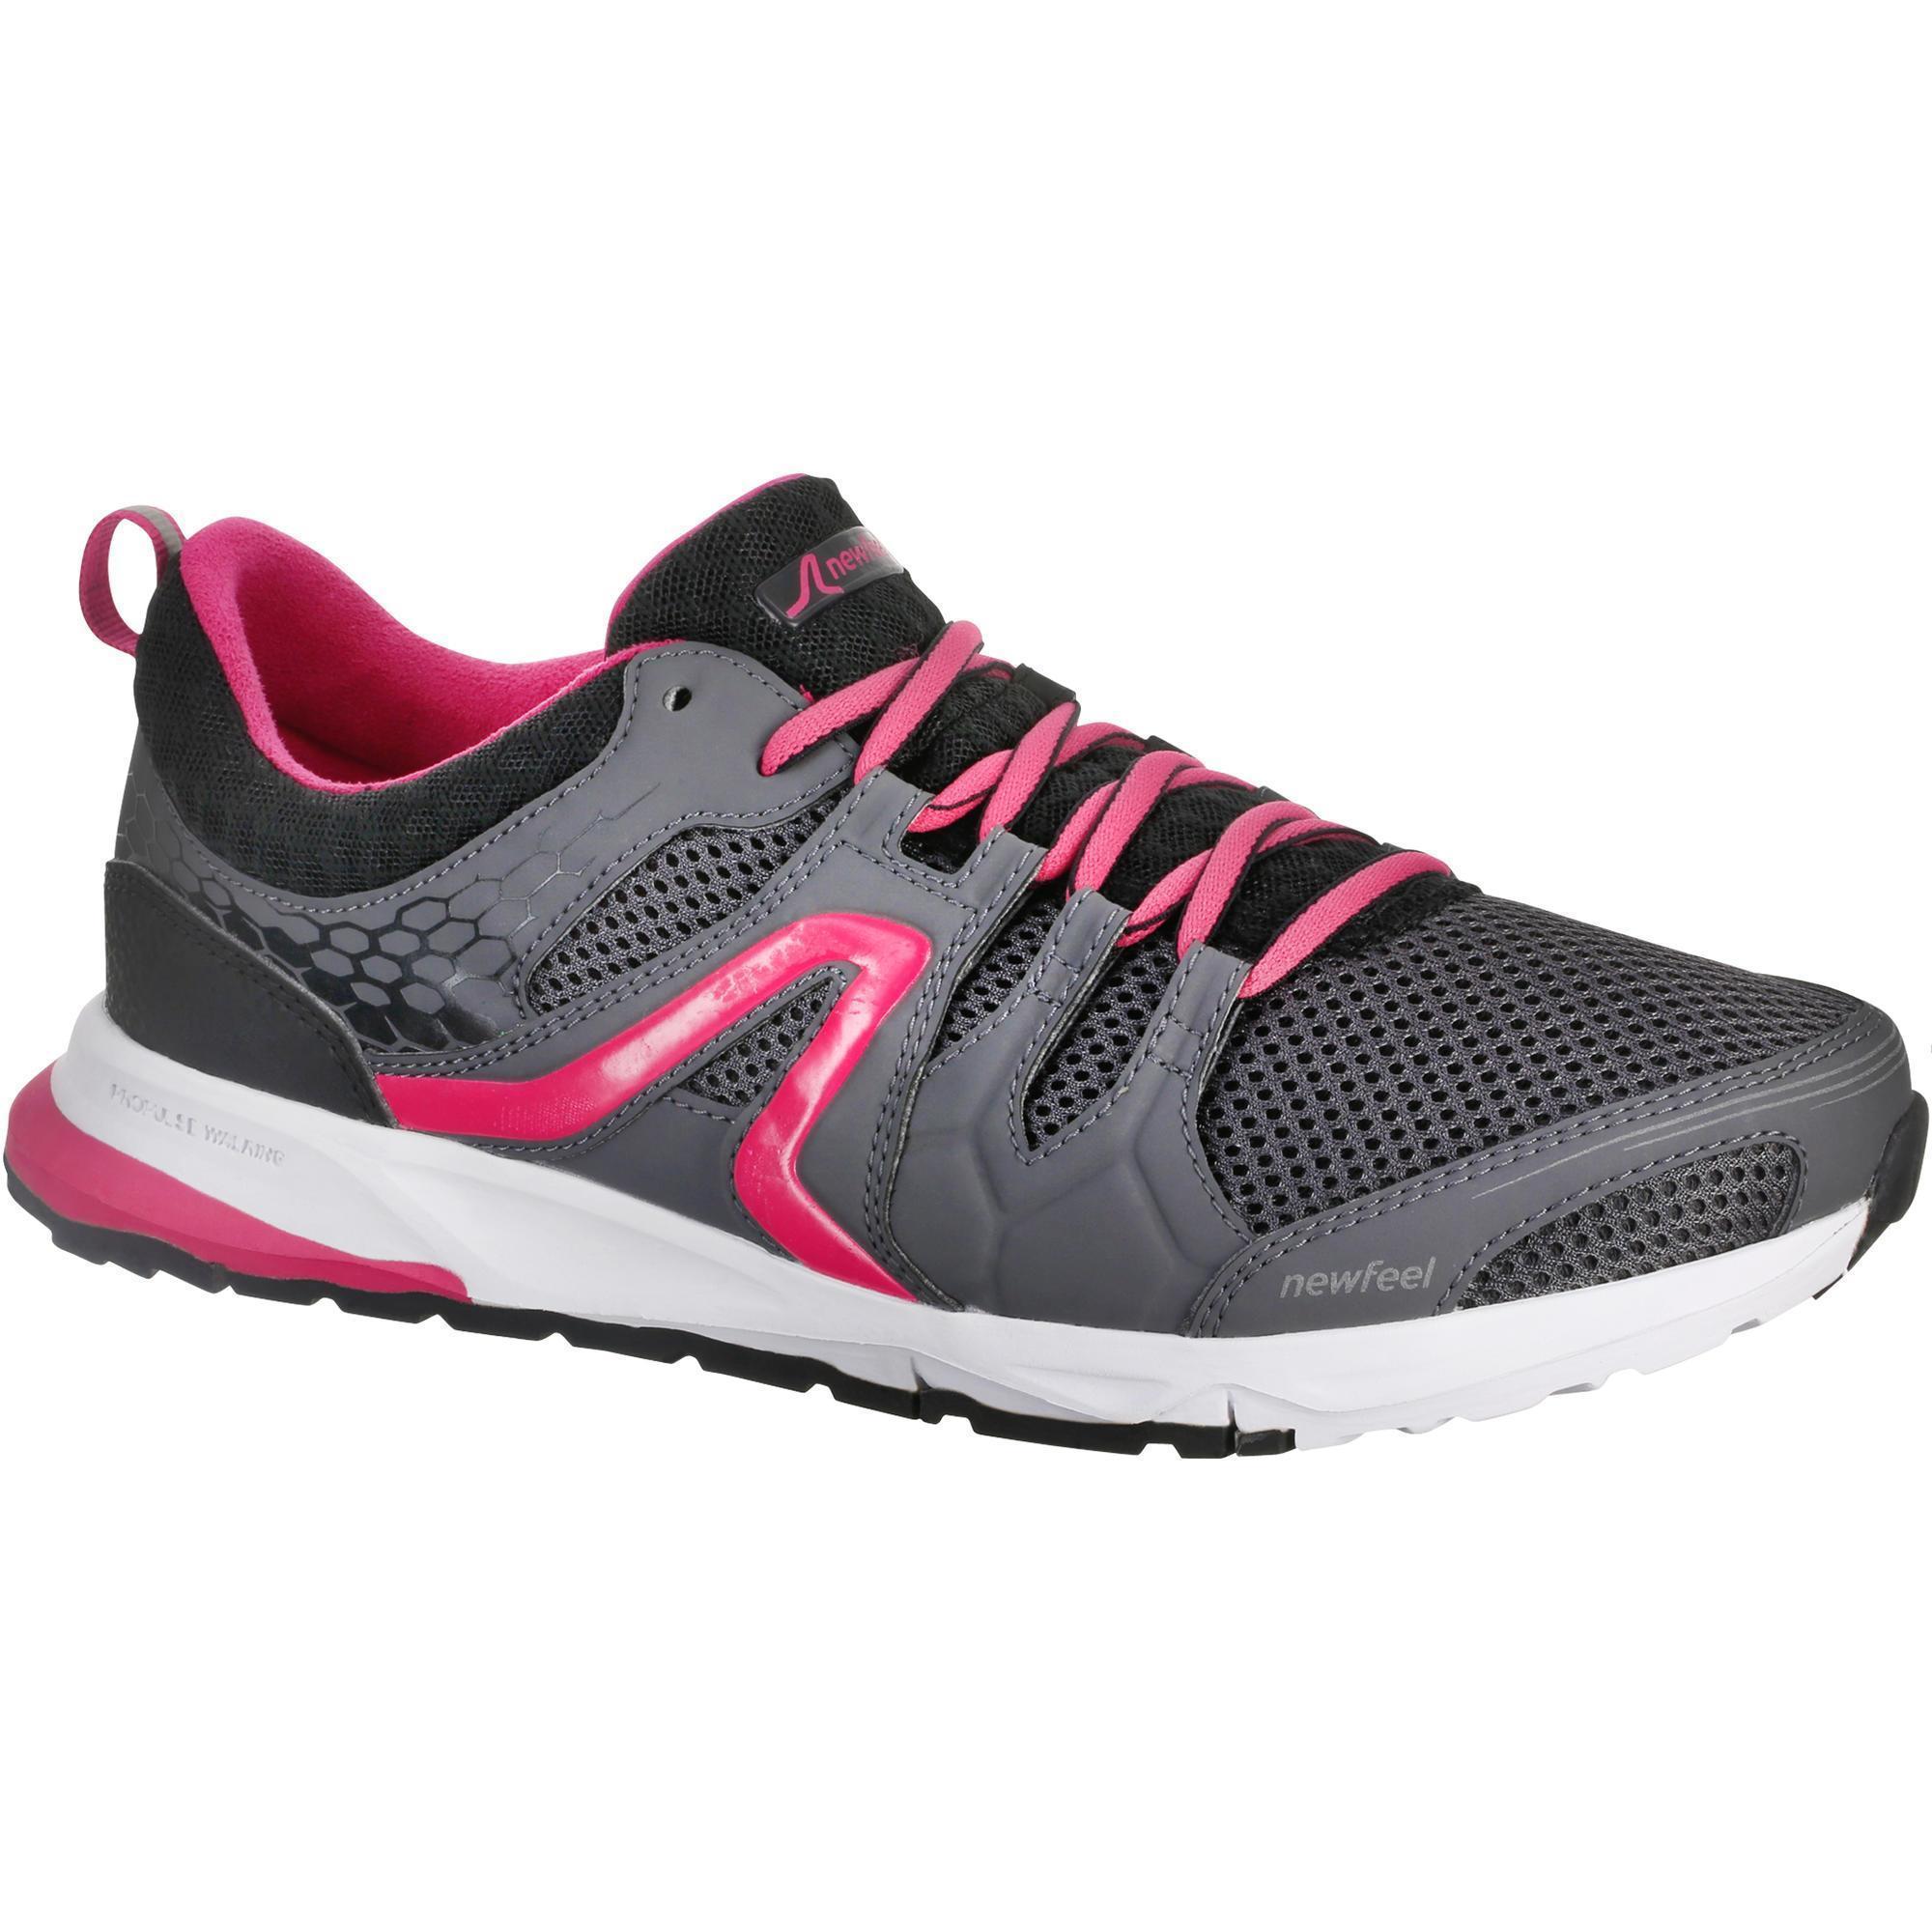 chaussures marche sportive femme pw 240 gris rose newfeel. Black Bedroom Furniture Sets. Home Design Ideas